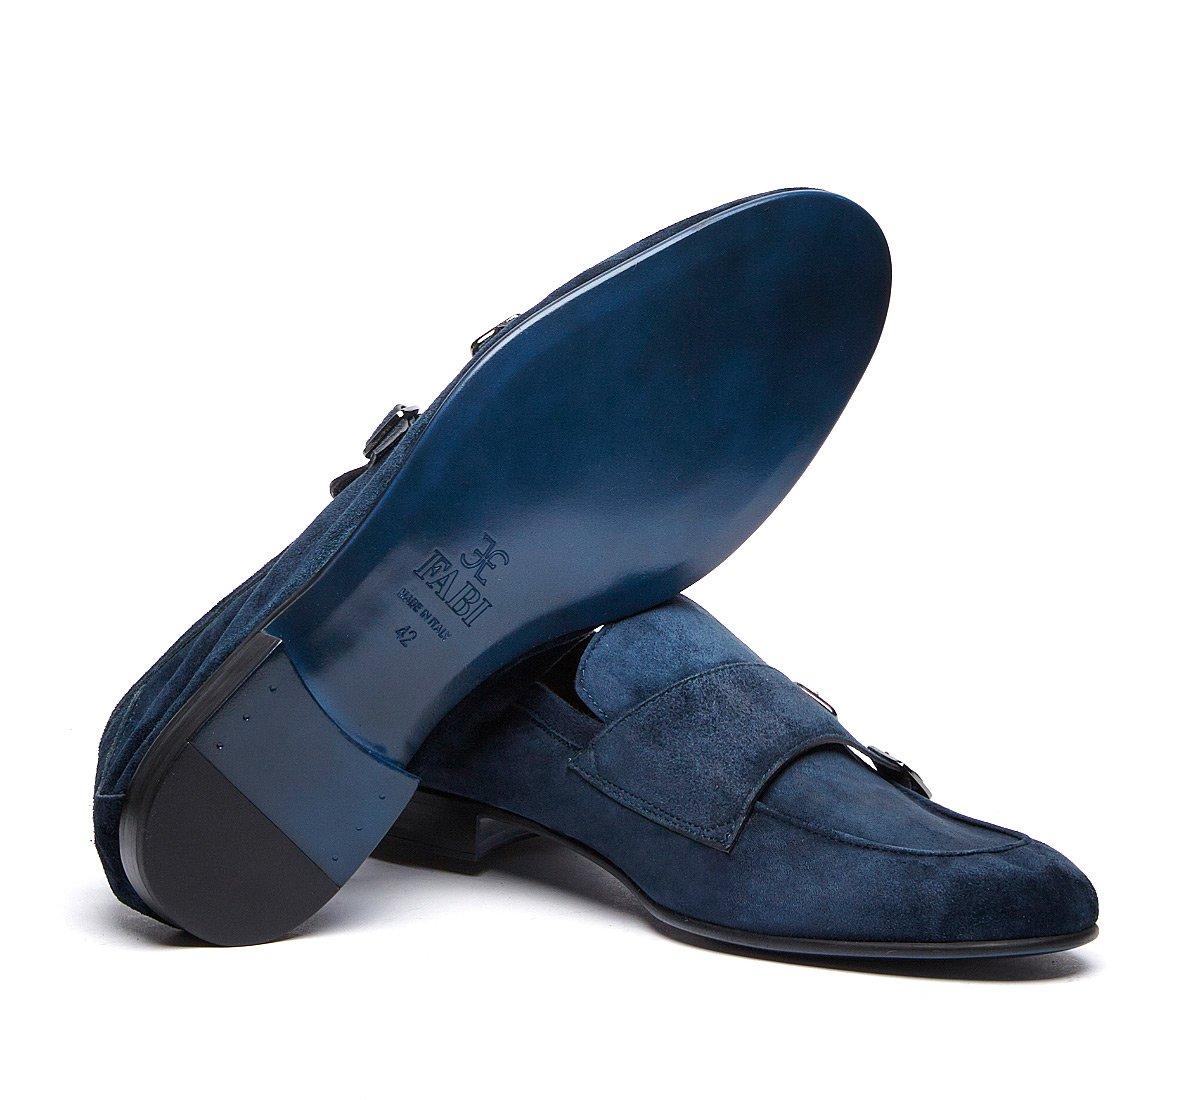 Double monk strap calfskin shoes